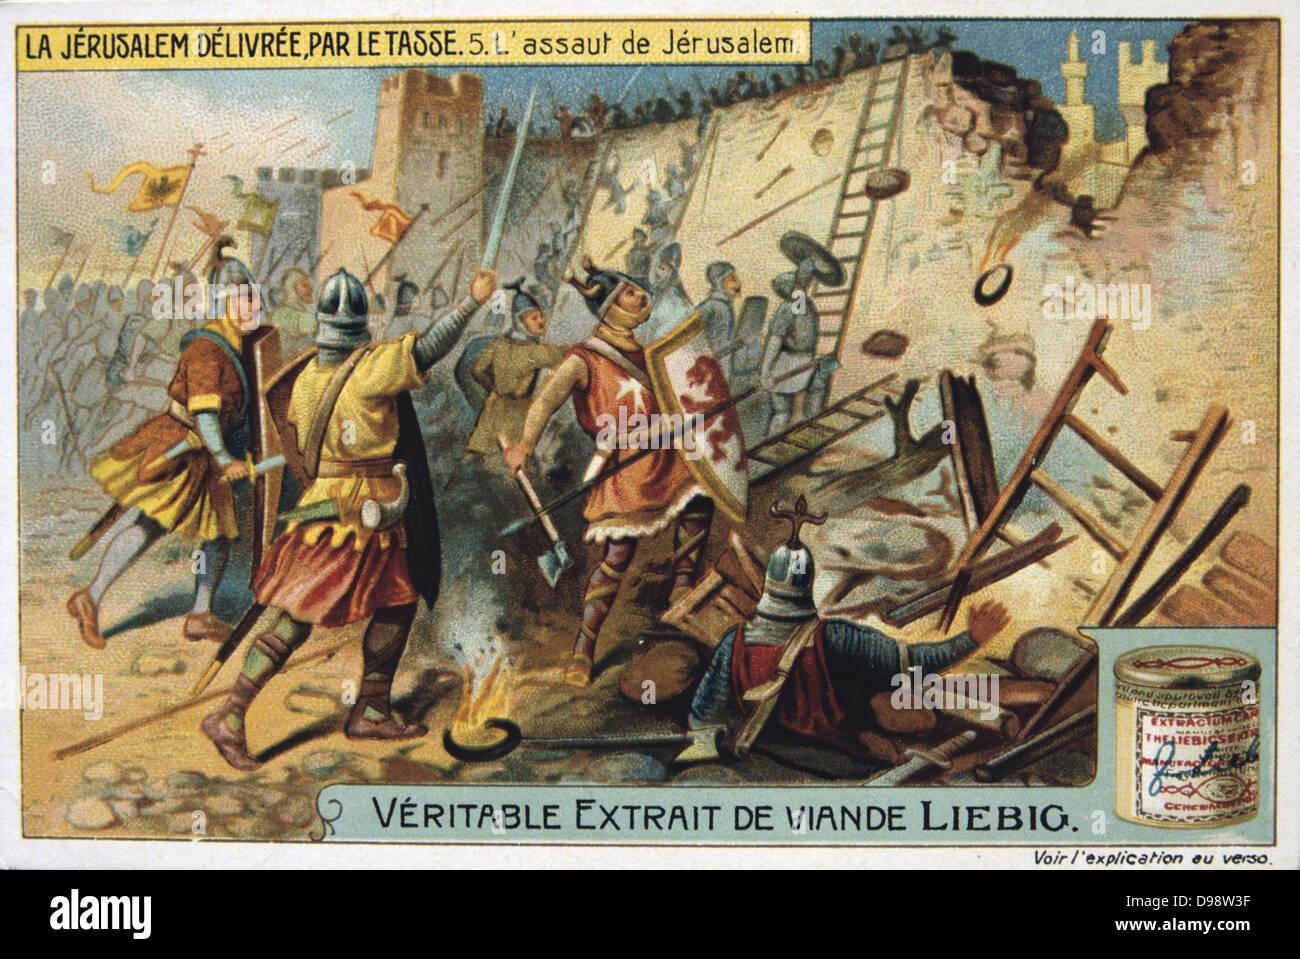 Jerusalem Delivered' (1580) epic poem by Torquato Tasso, Italian poet.  Fictionalised story of First Crusade 1095-1099.